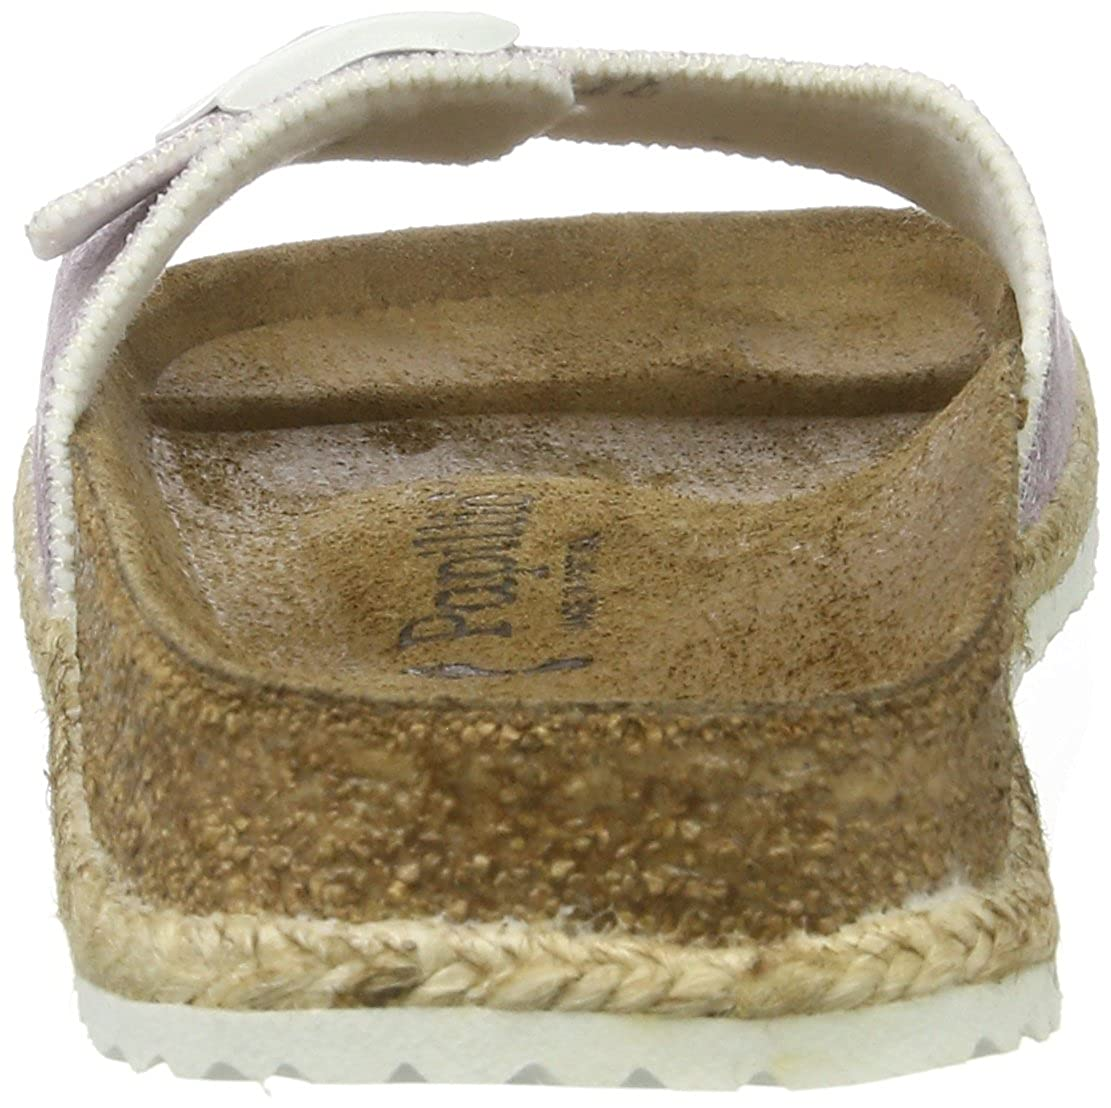 1004254 Femme Chaussures Birko Madrid Mules Flor Papillio LVqUGSpzM